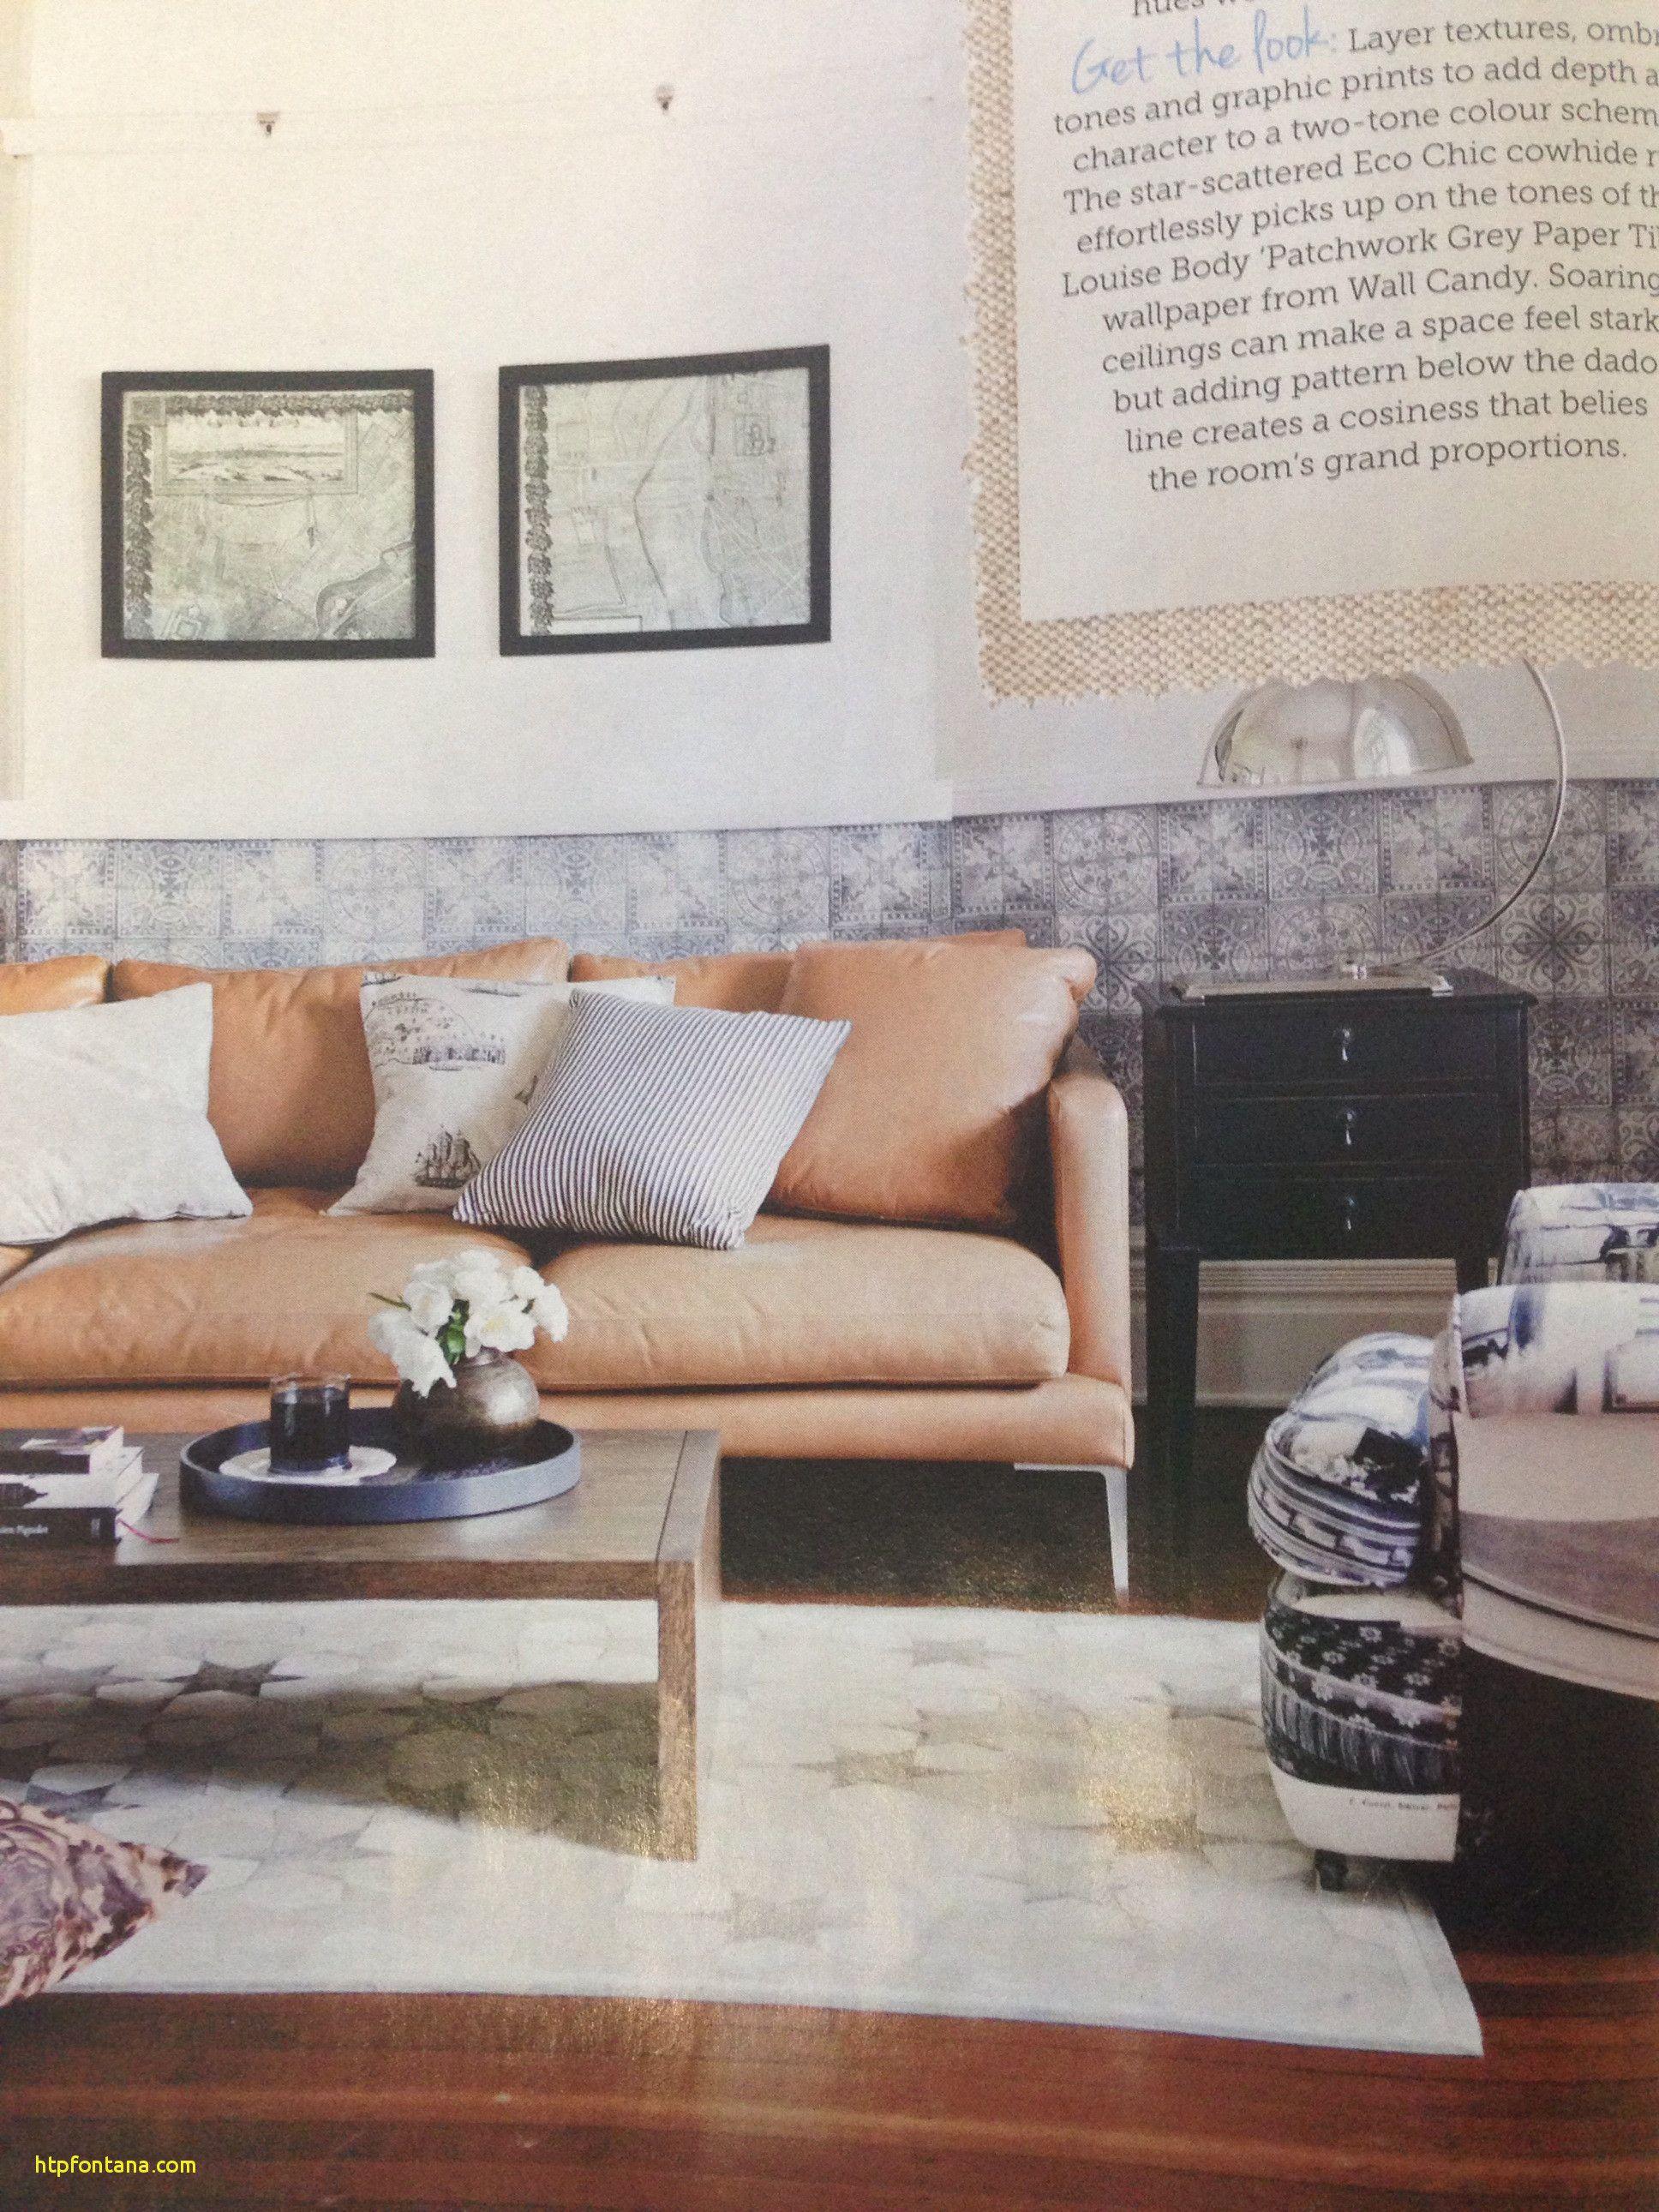 sleek living room refurbish  june 2018  tan living room